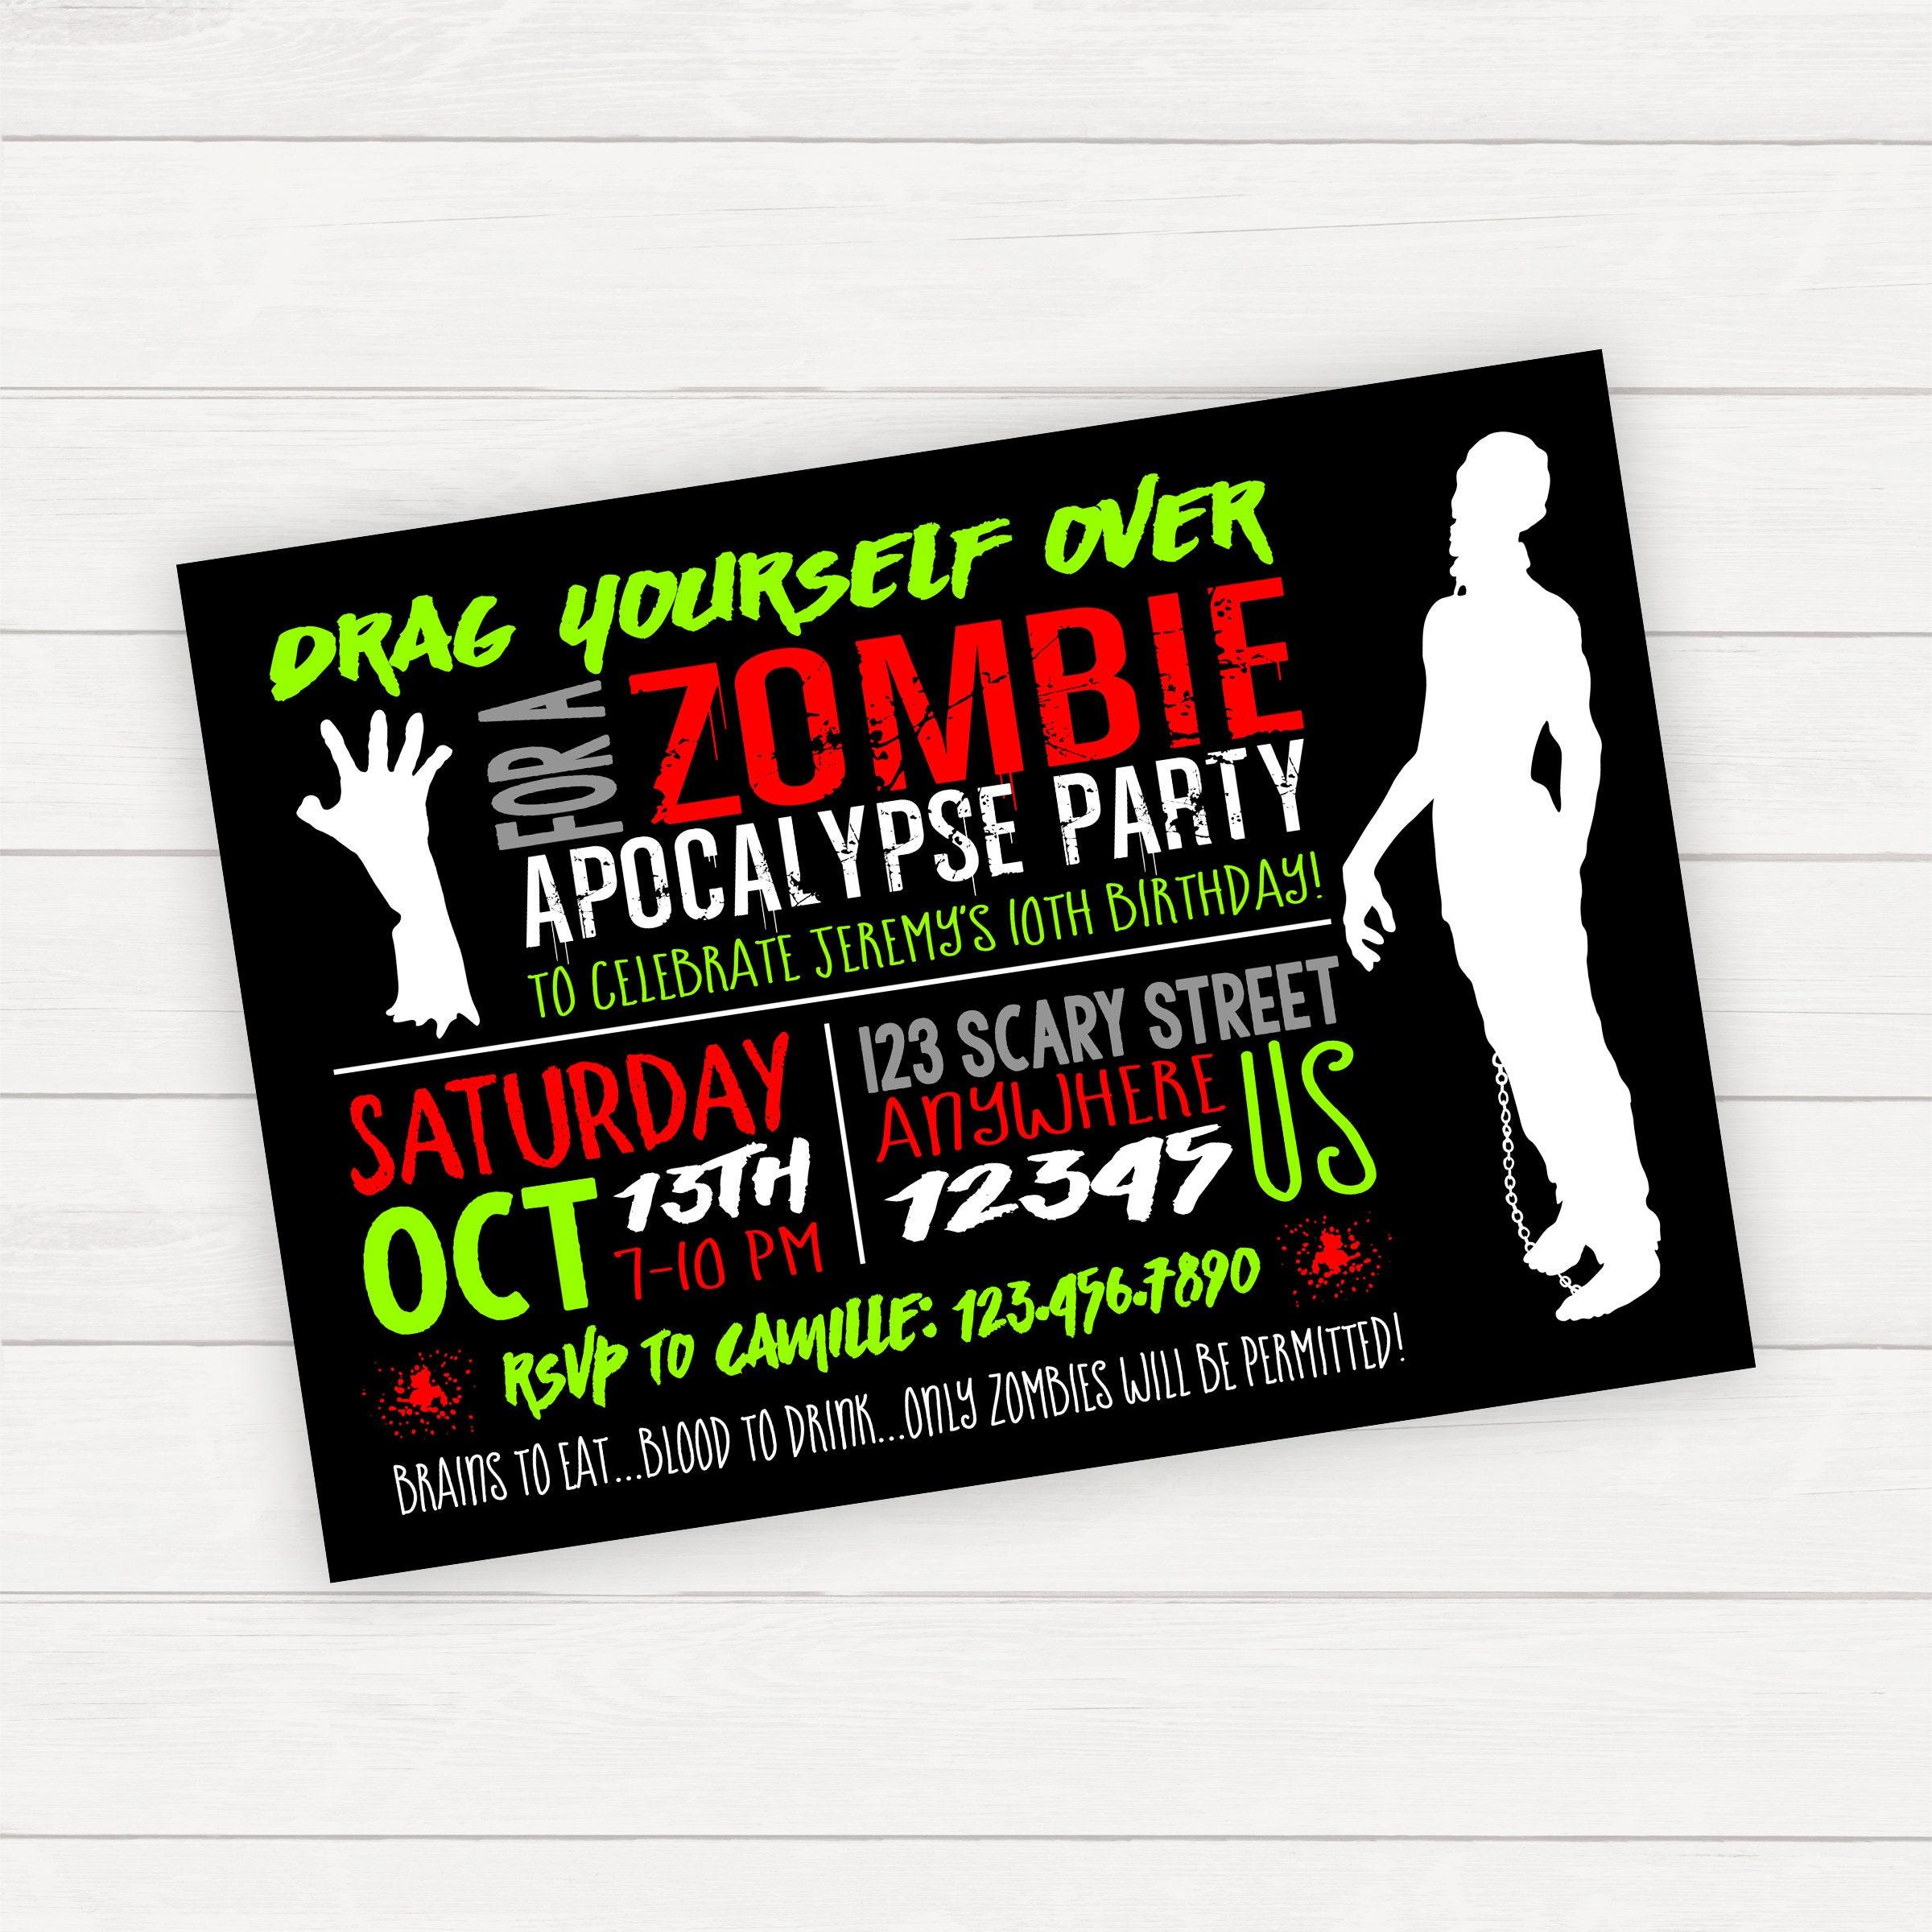 Zombie invitation zombie party zombie apocalypse halloween etsy zoom solutioingenieria Choice Image